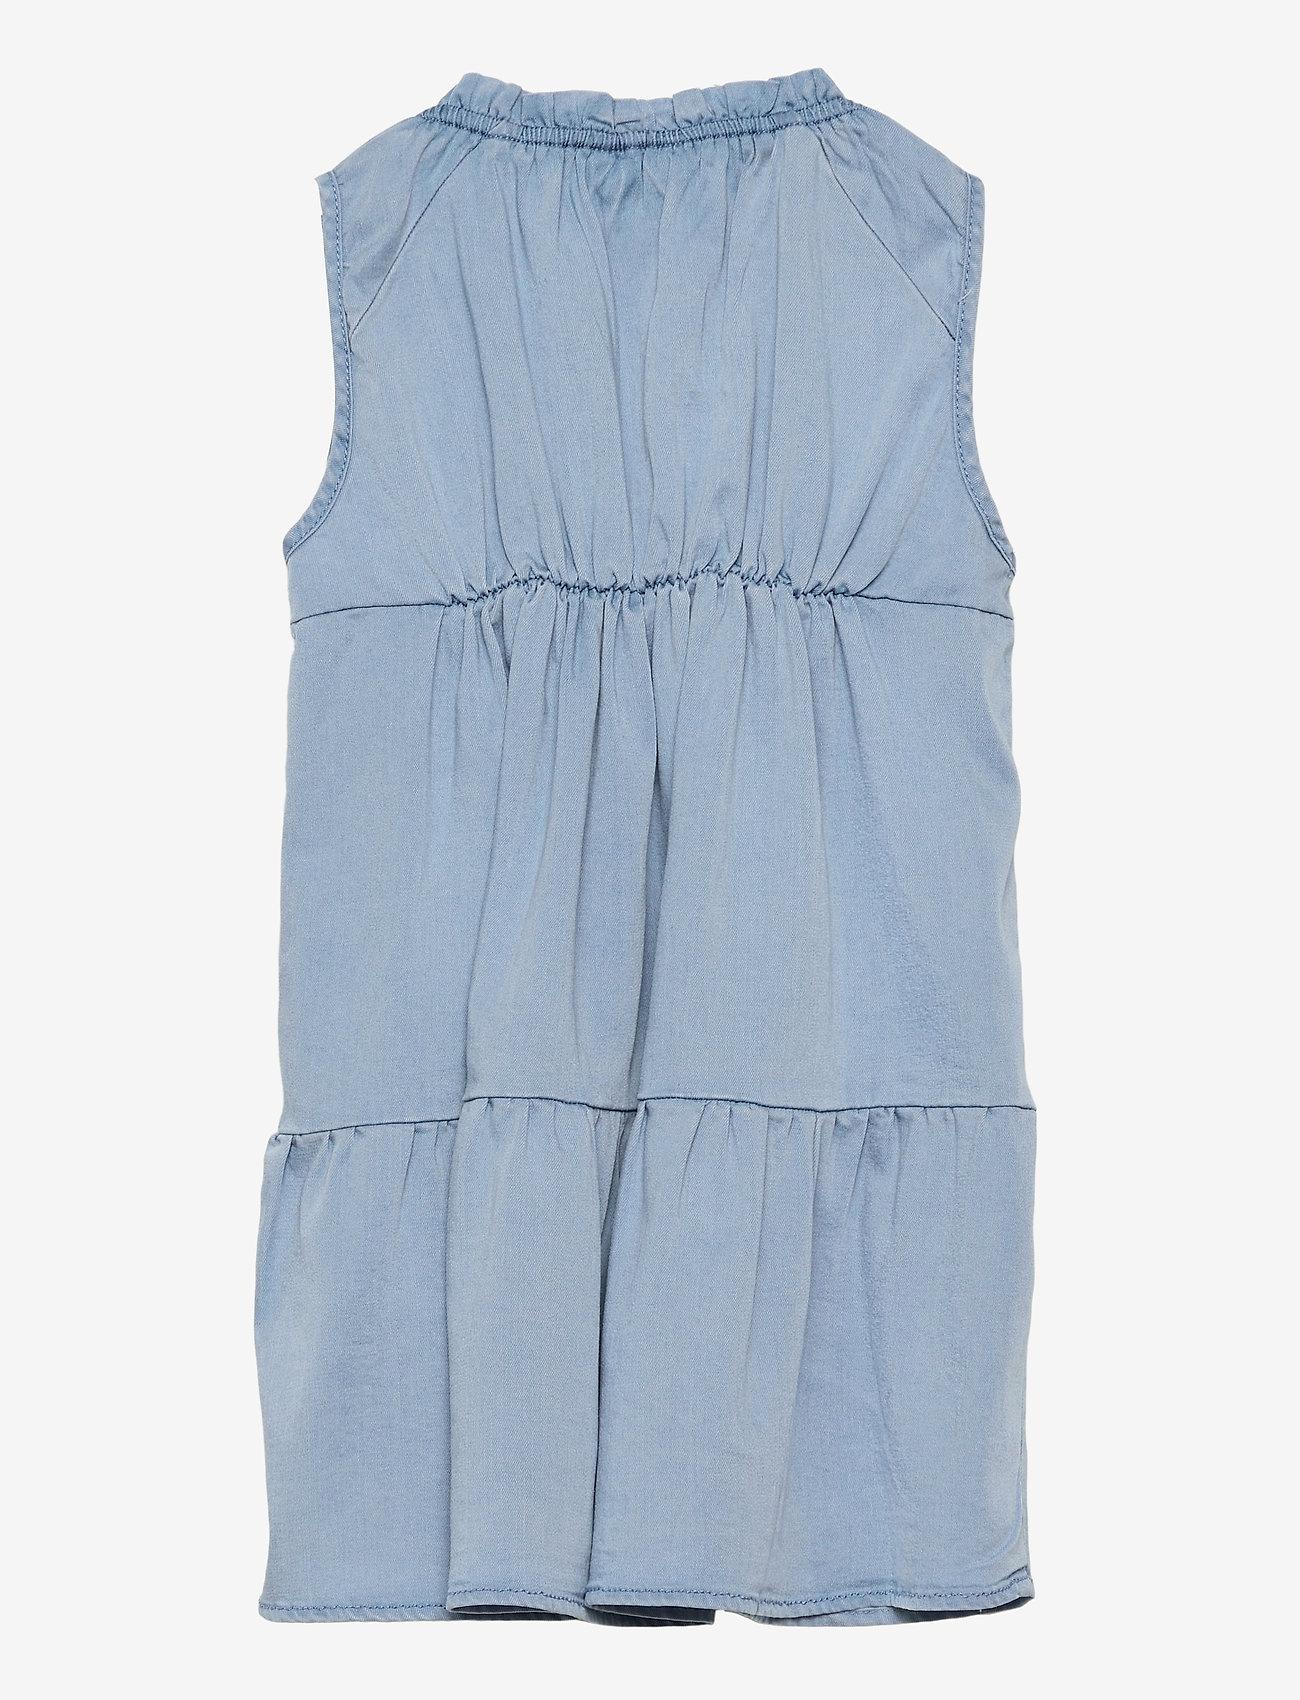 name it - NMFBATAS DNM 1496 S/L DRESS - kleider - light blue denim - 1